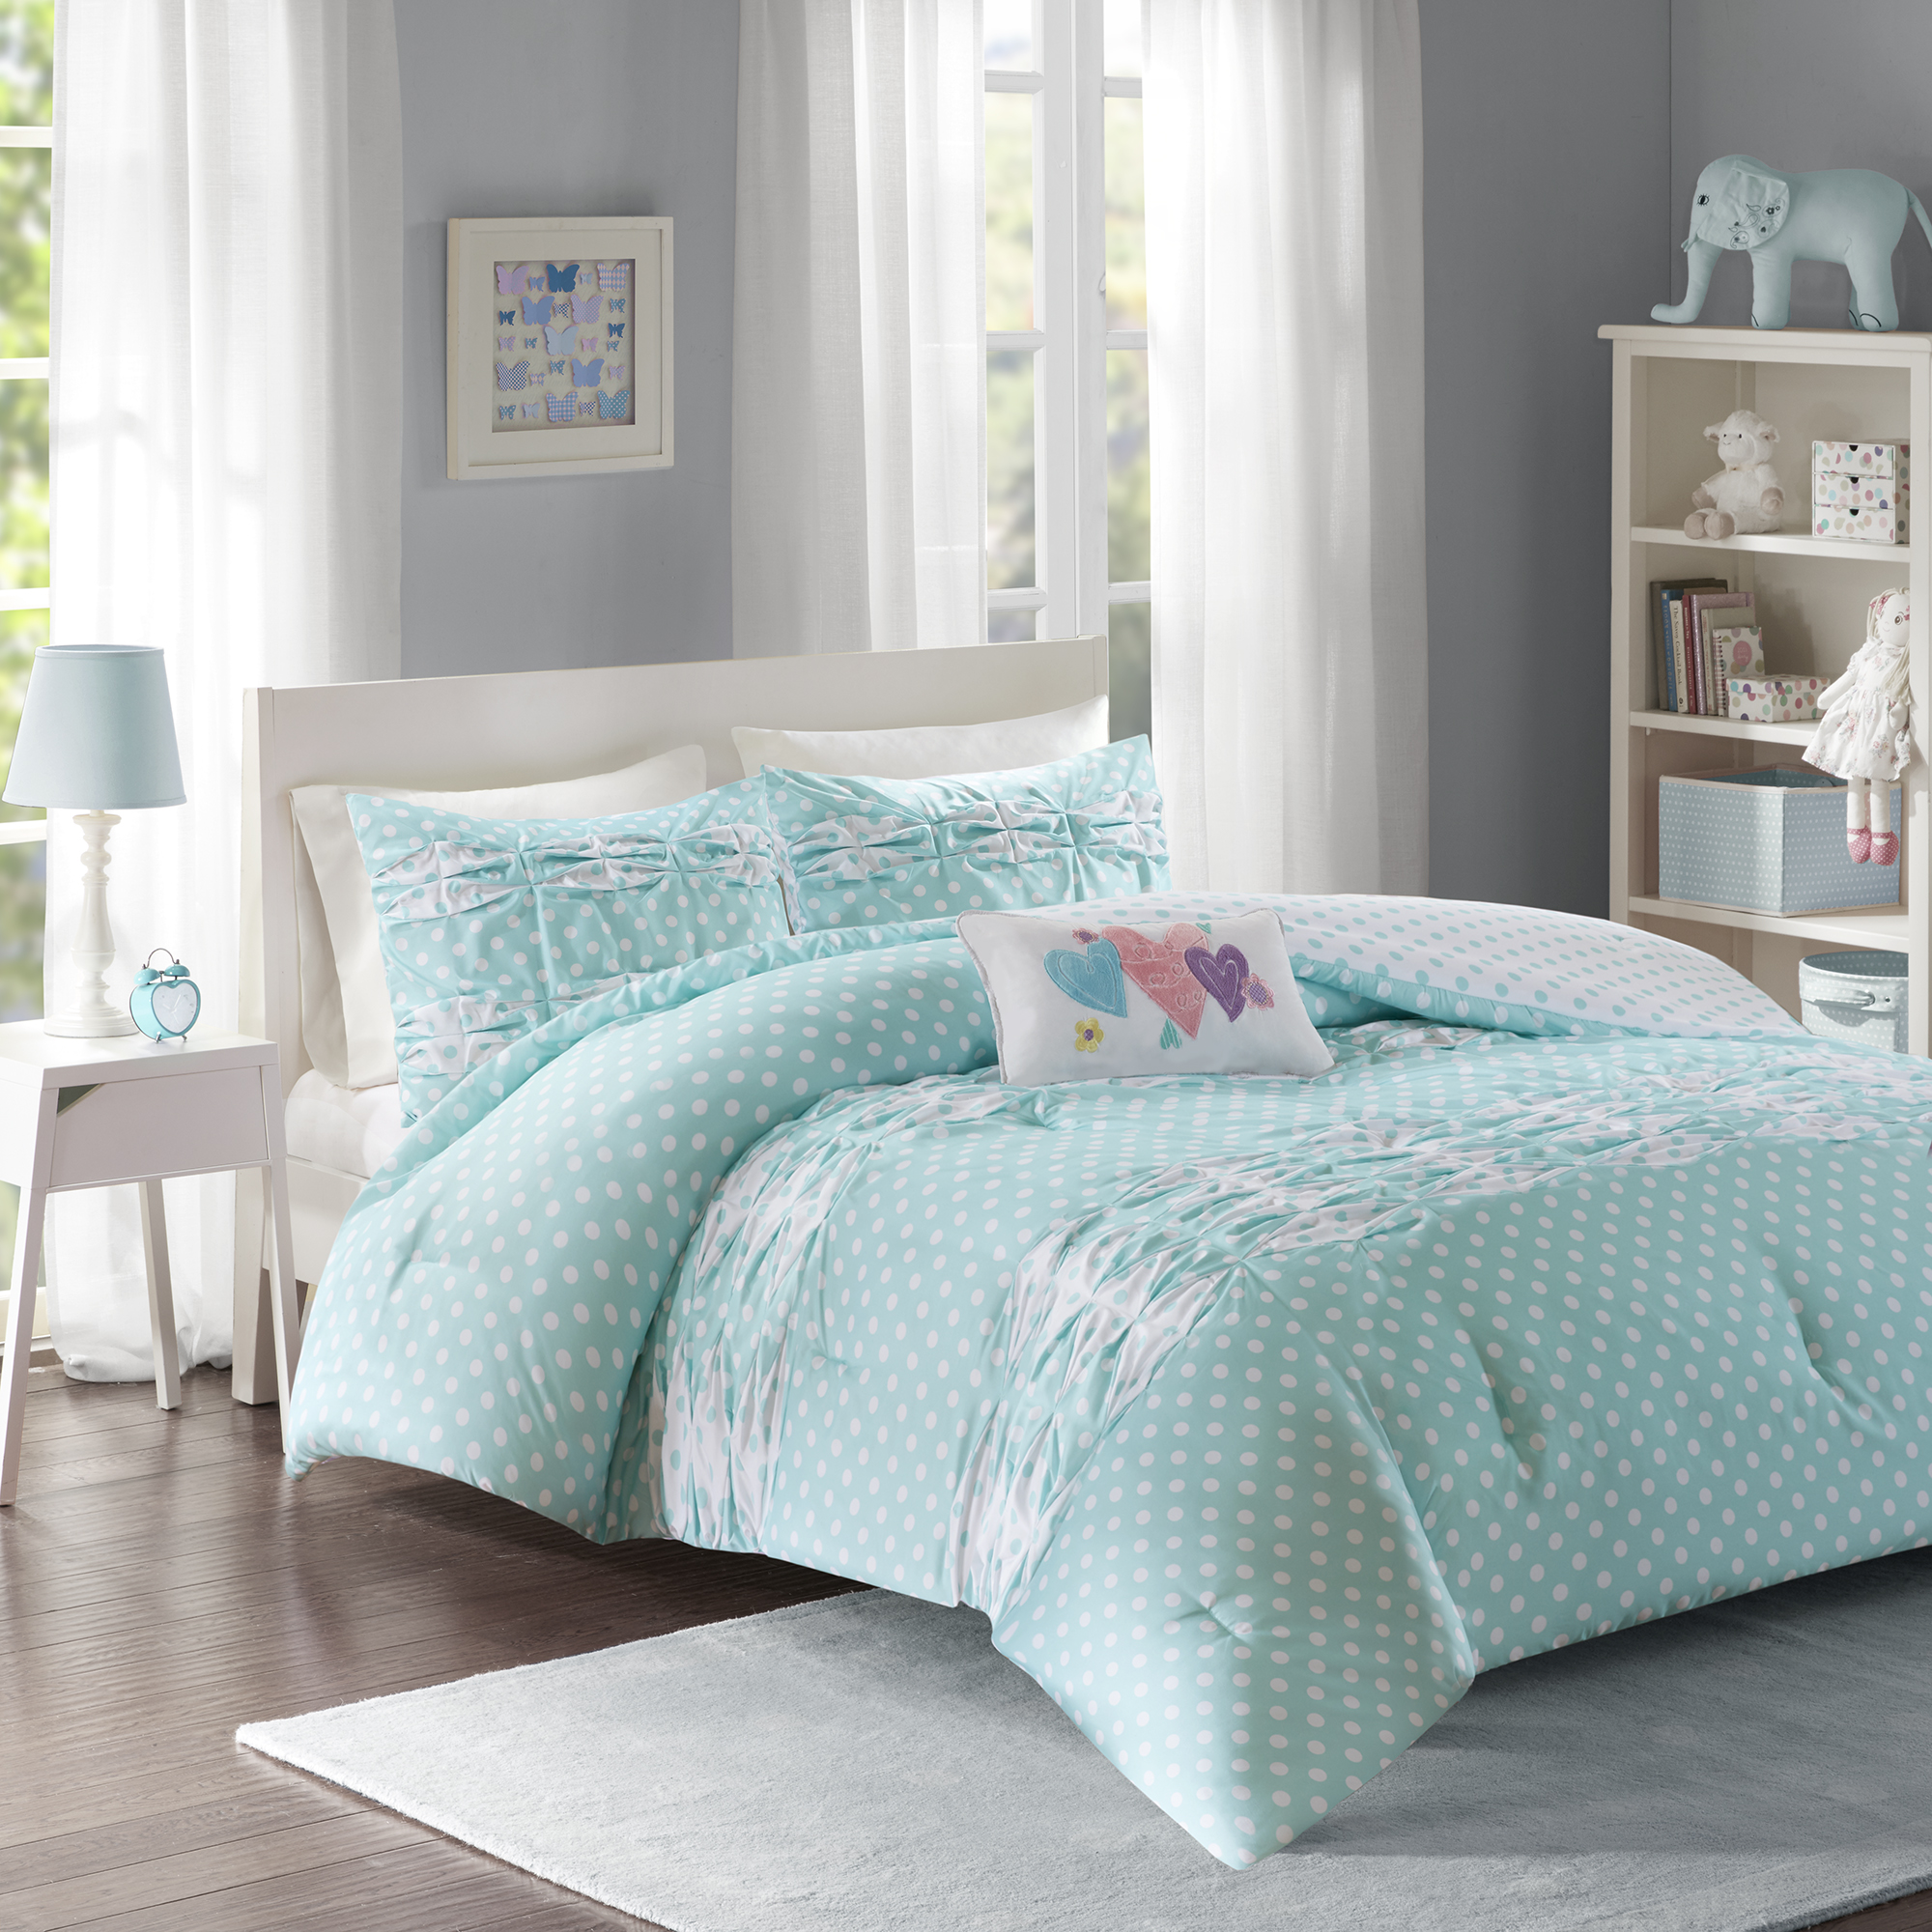 Home Essence Teen Ella Printed Comforter Bedding Set by E&E Co.